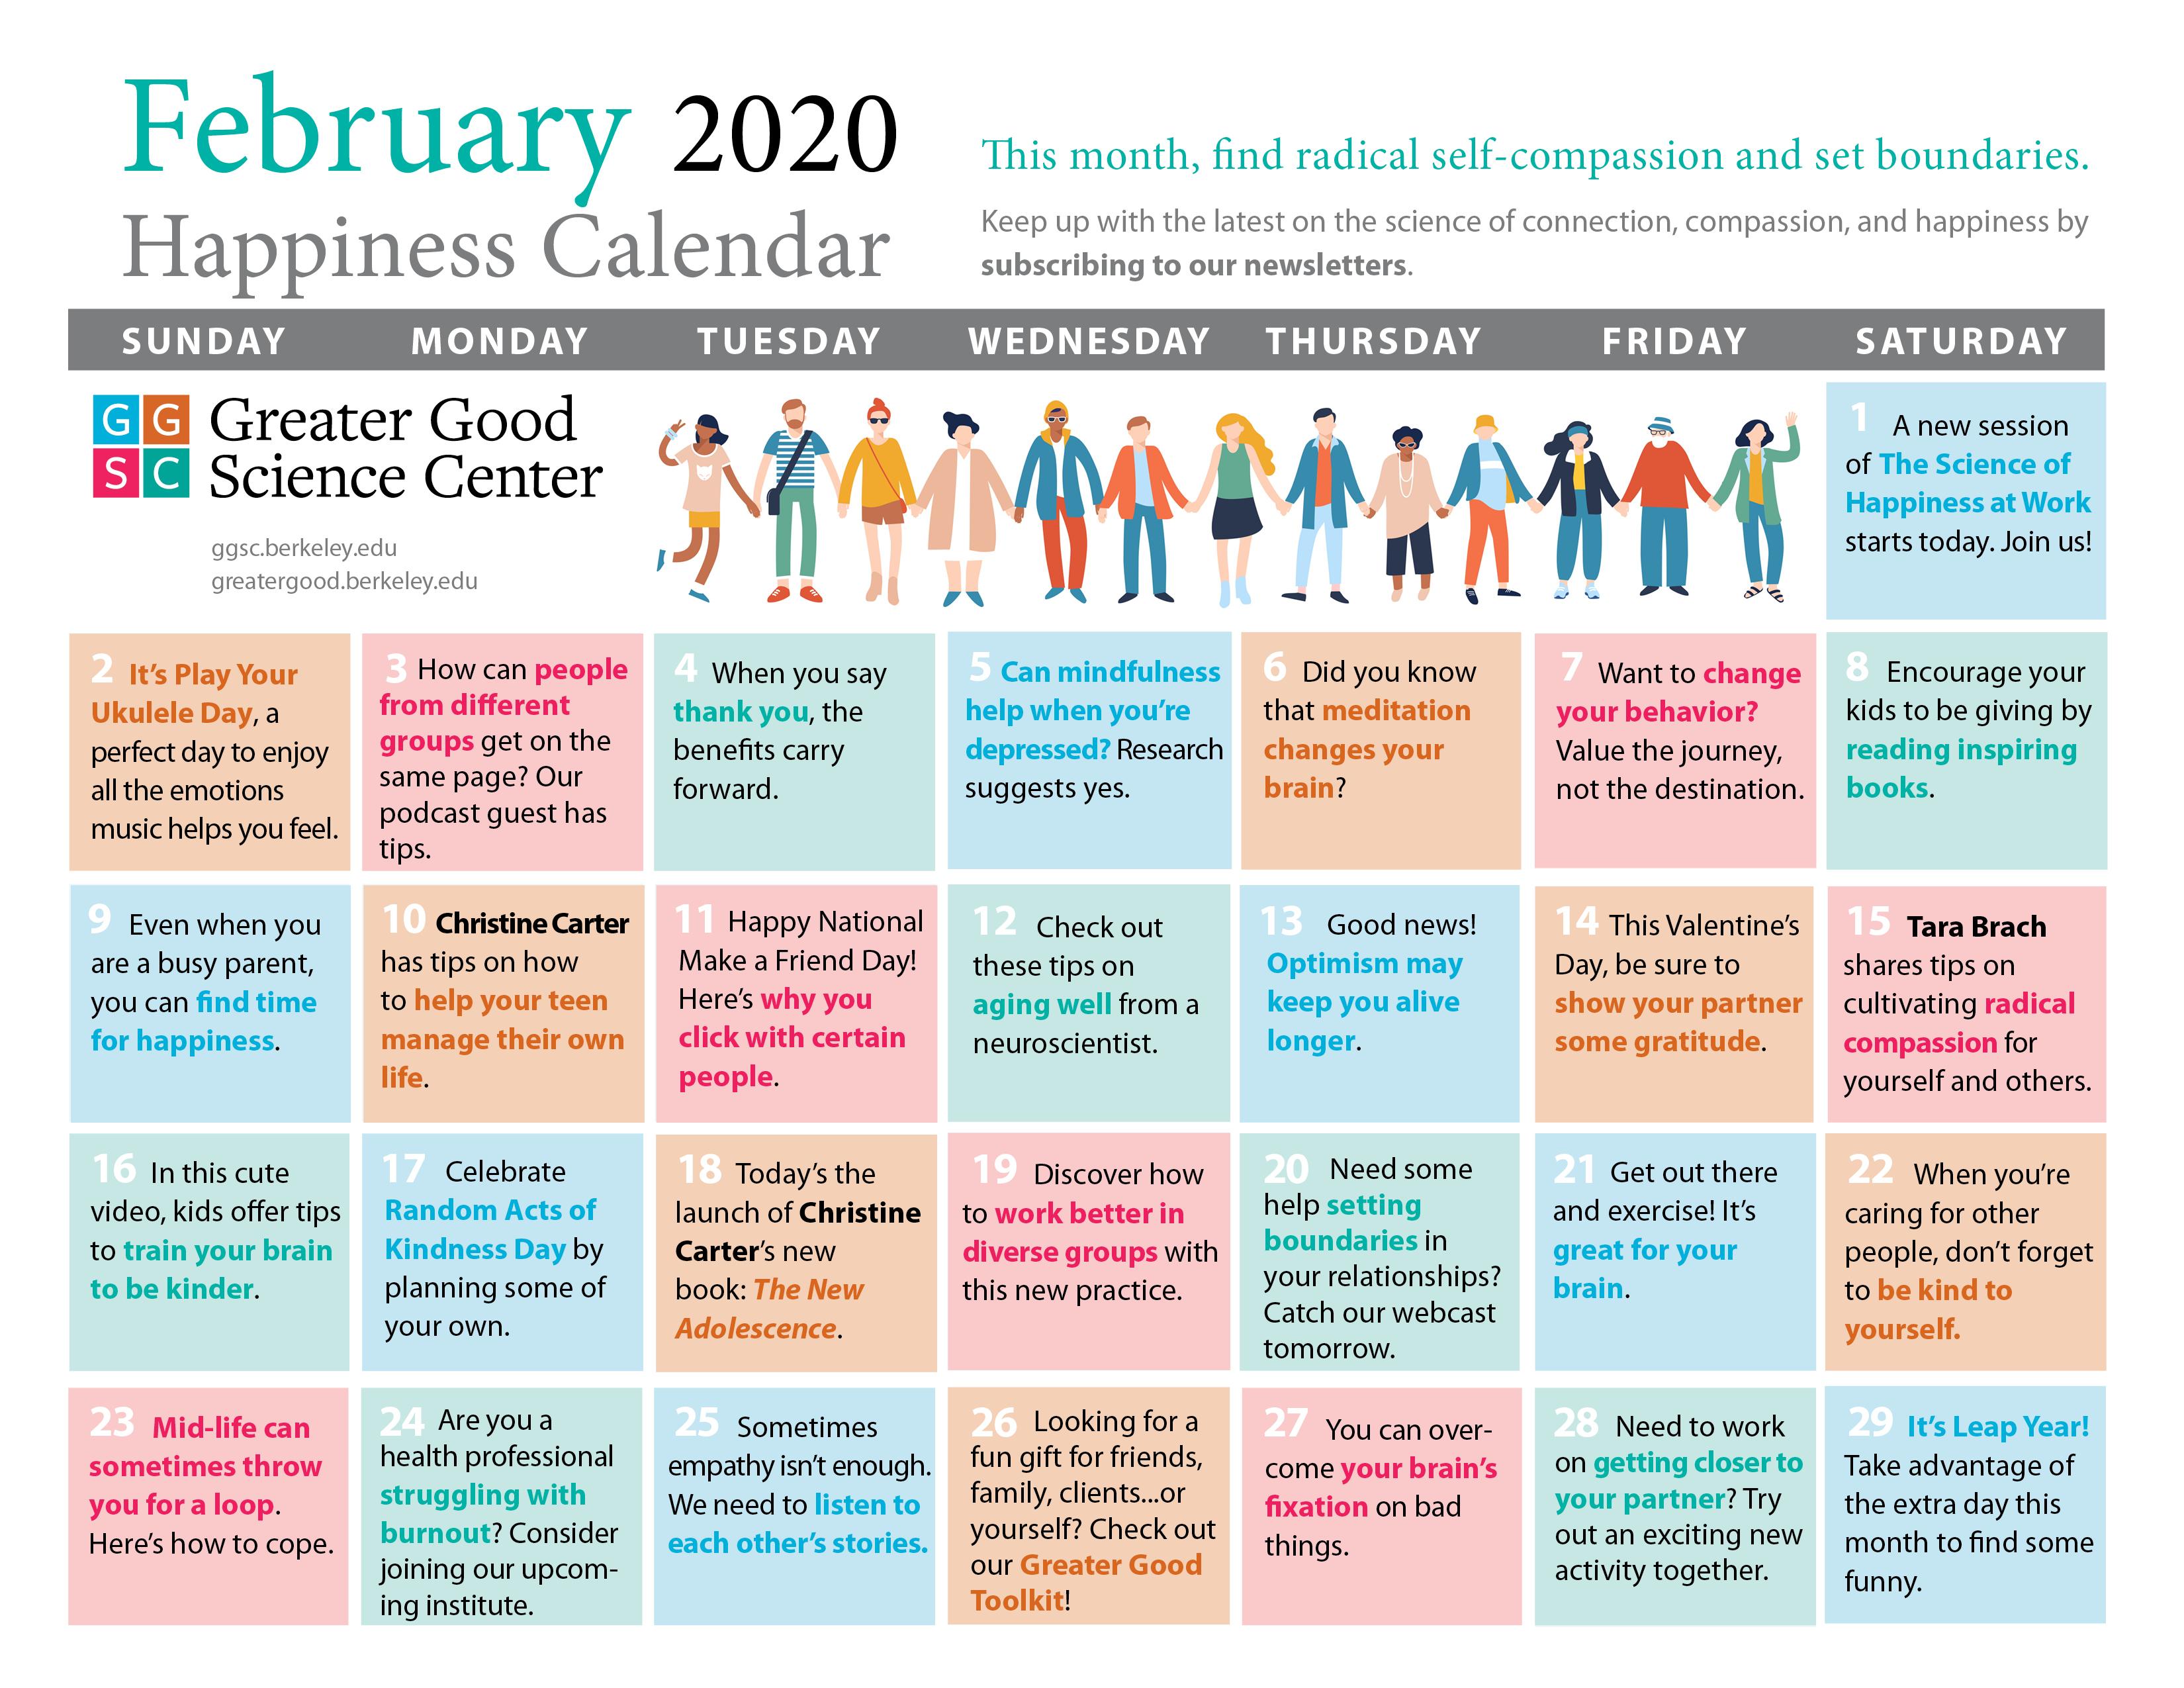 February 2020 Happiness Calendar